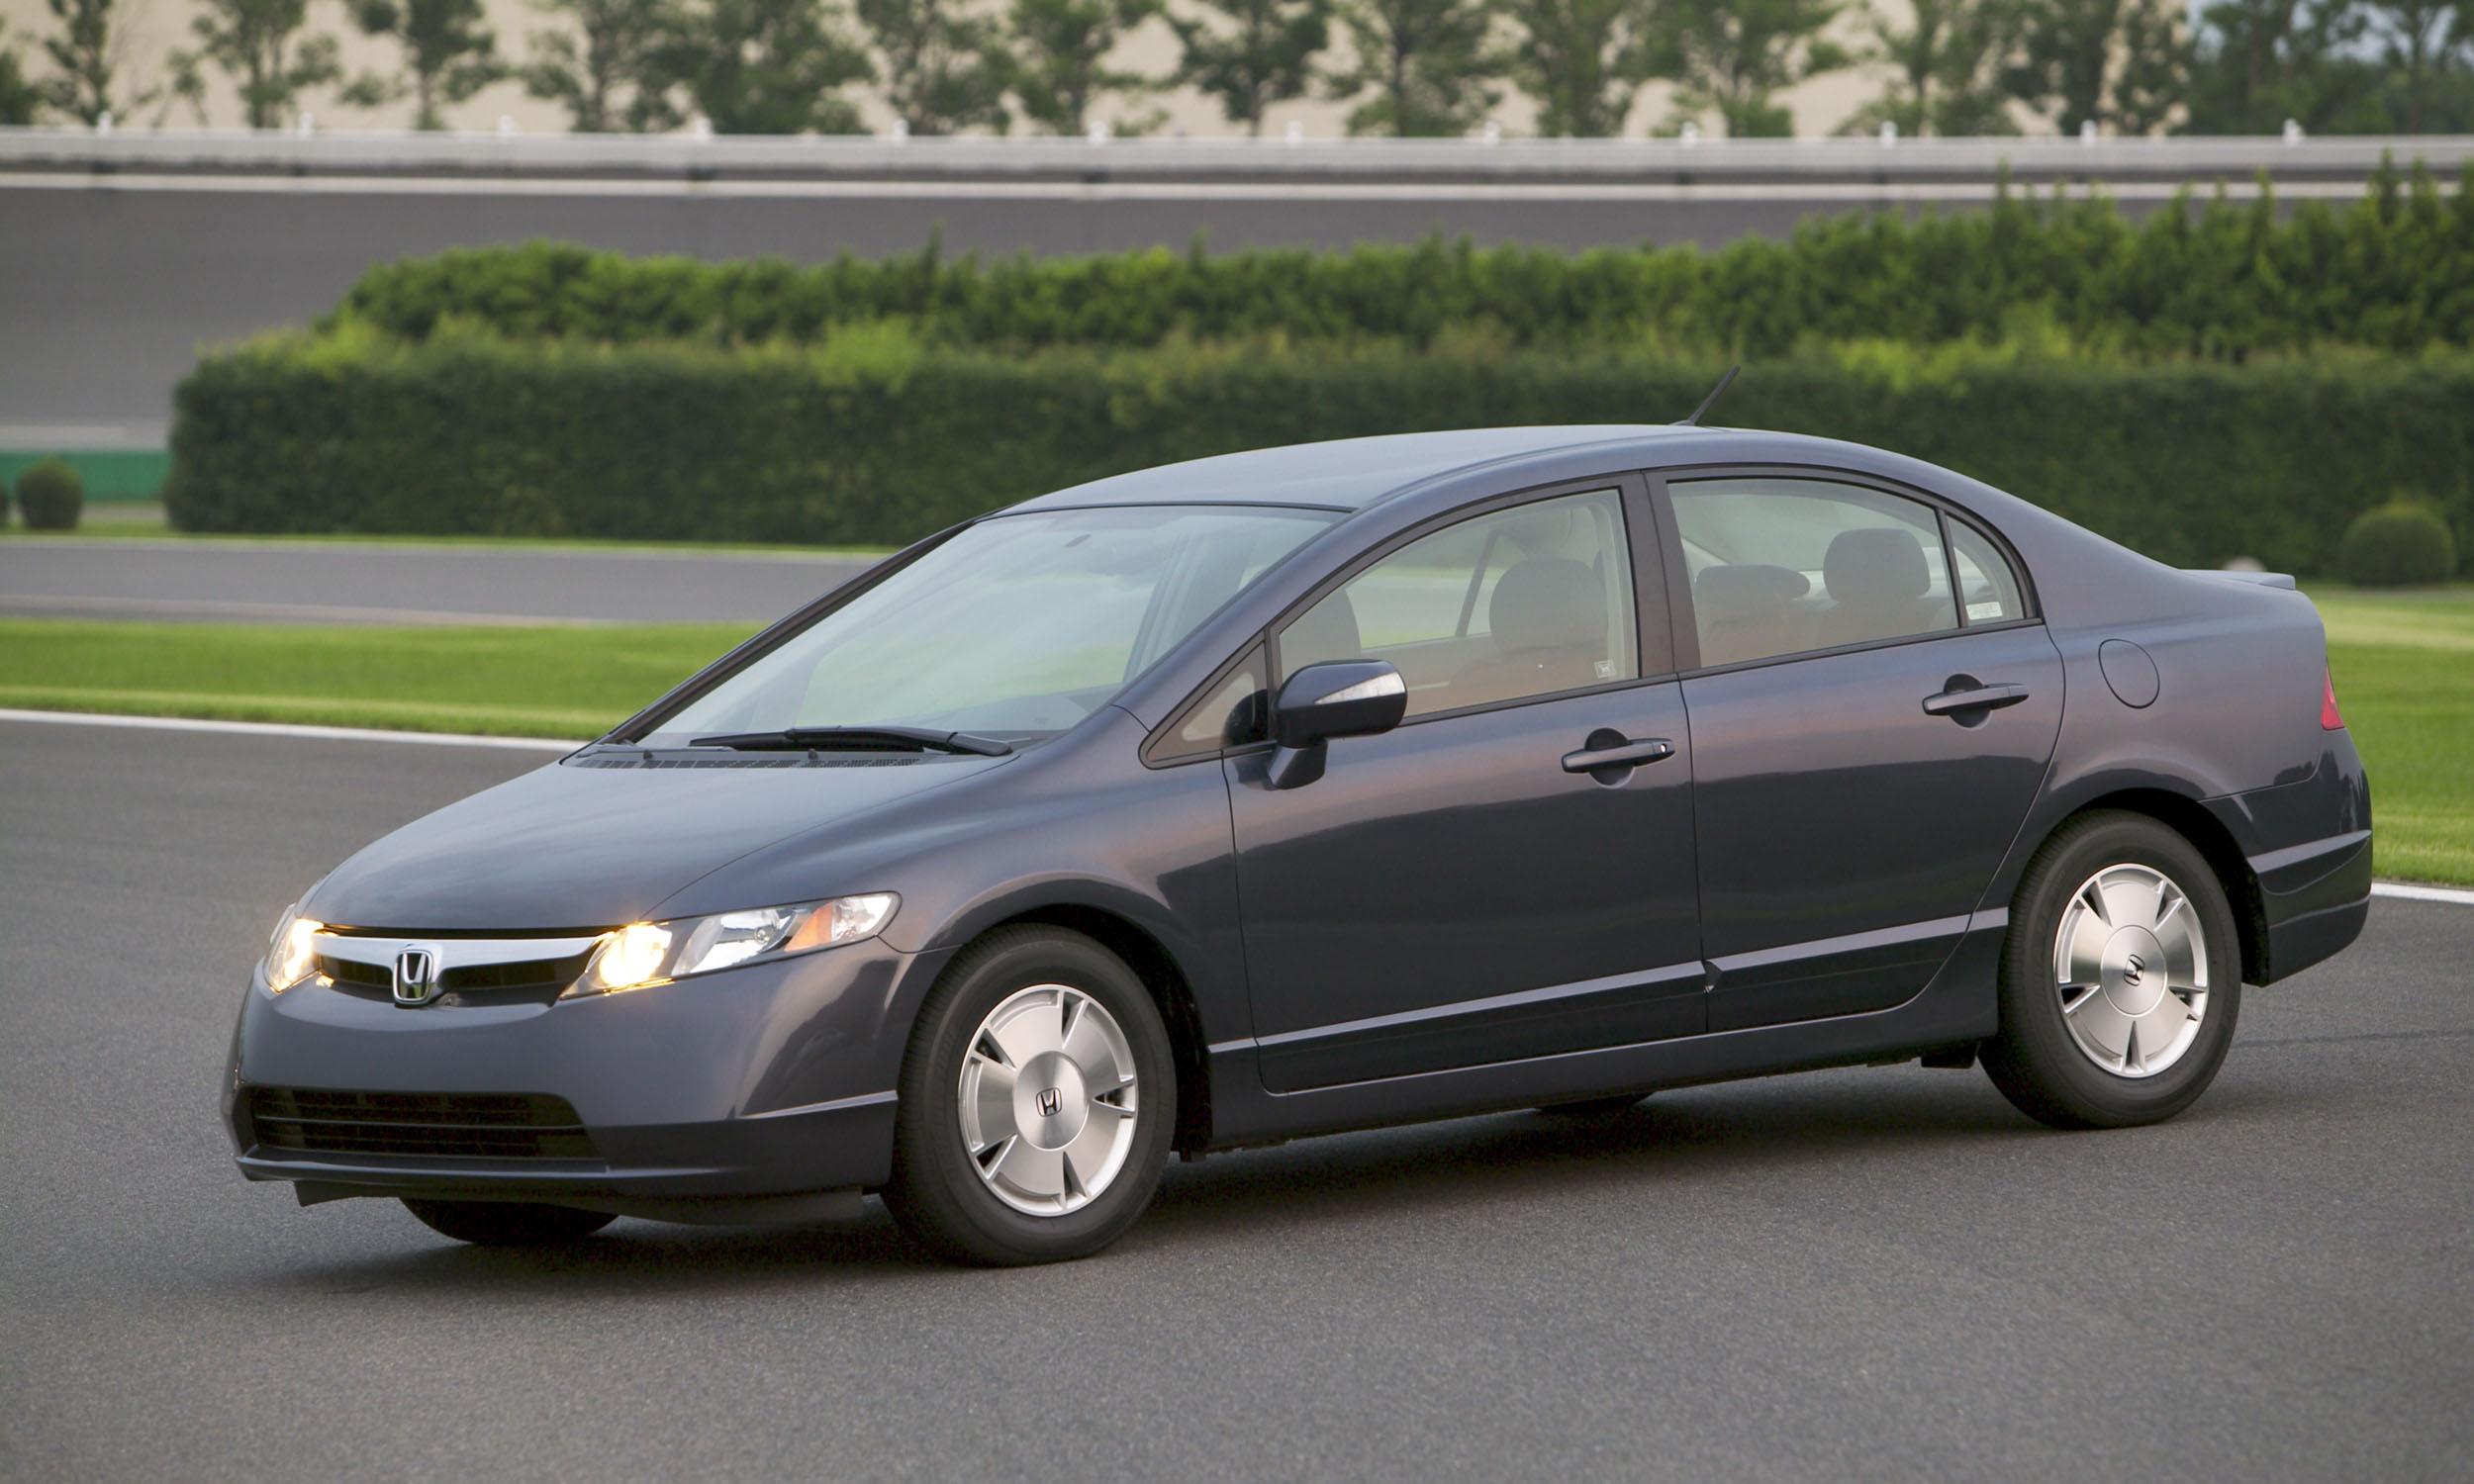 © American Honda Motor Co., Inc